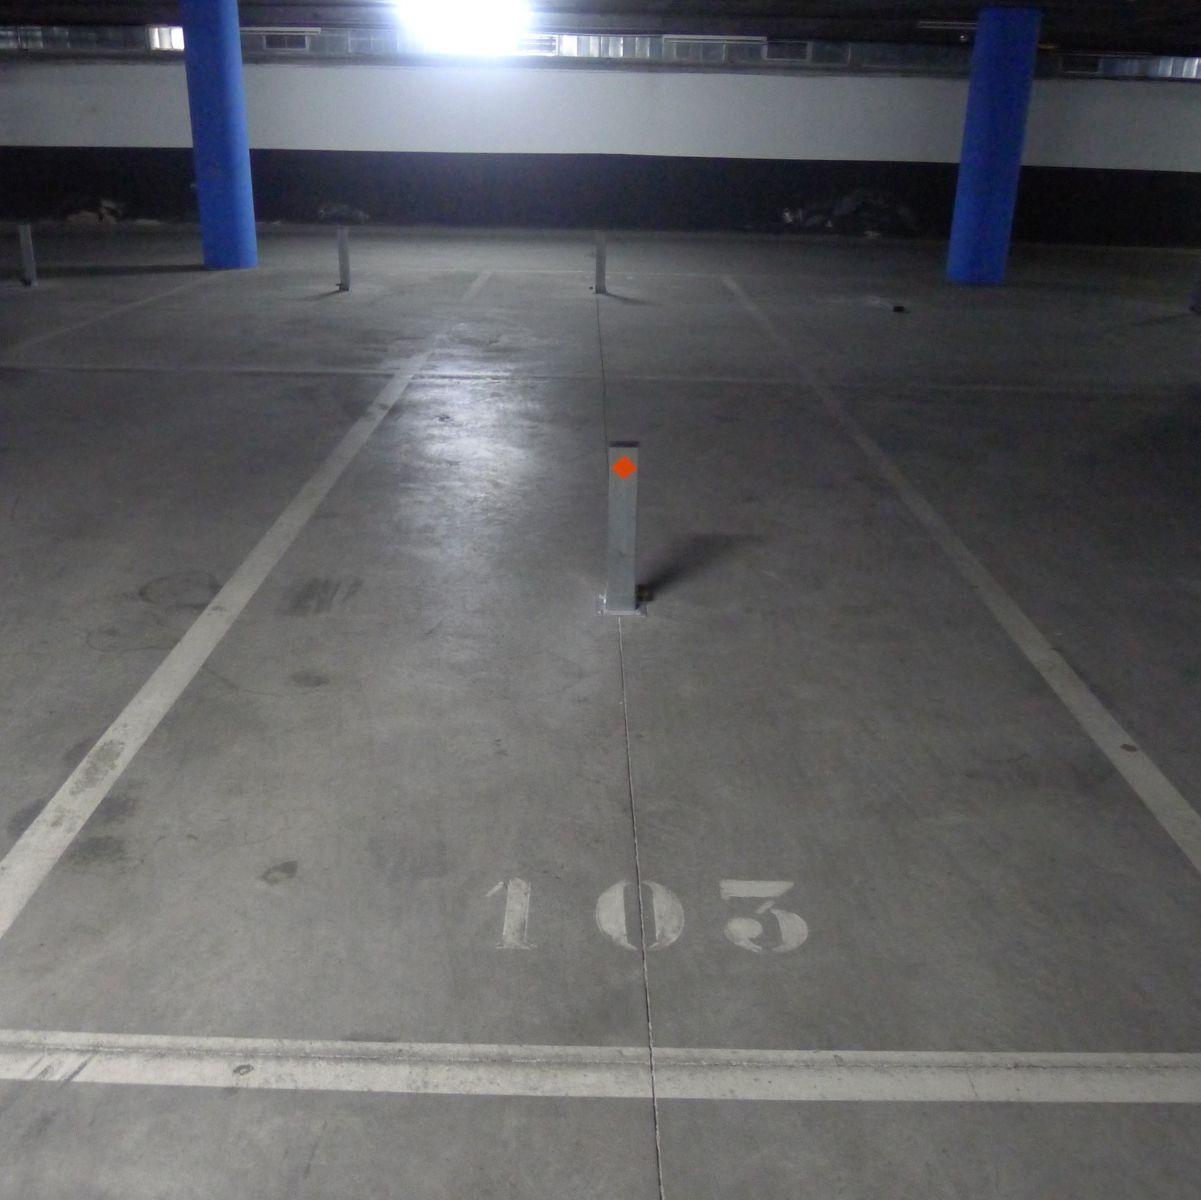 Alquiler Parking coche  Rambla sant jordi. Plaza abierta en alquiler en ramblas.